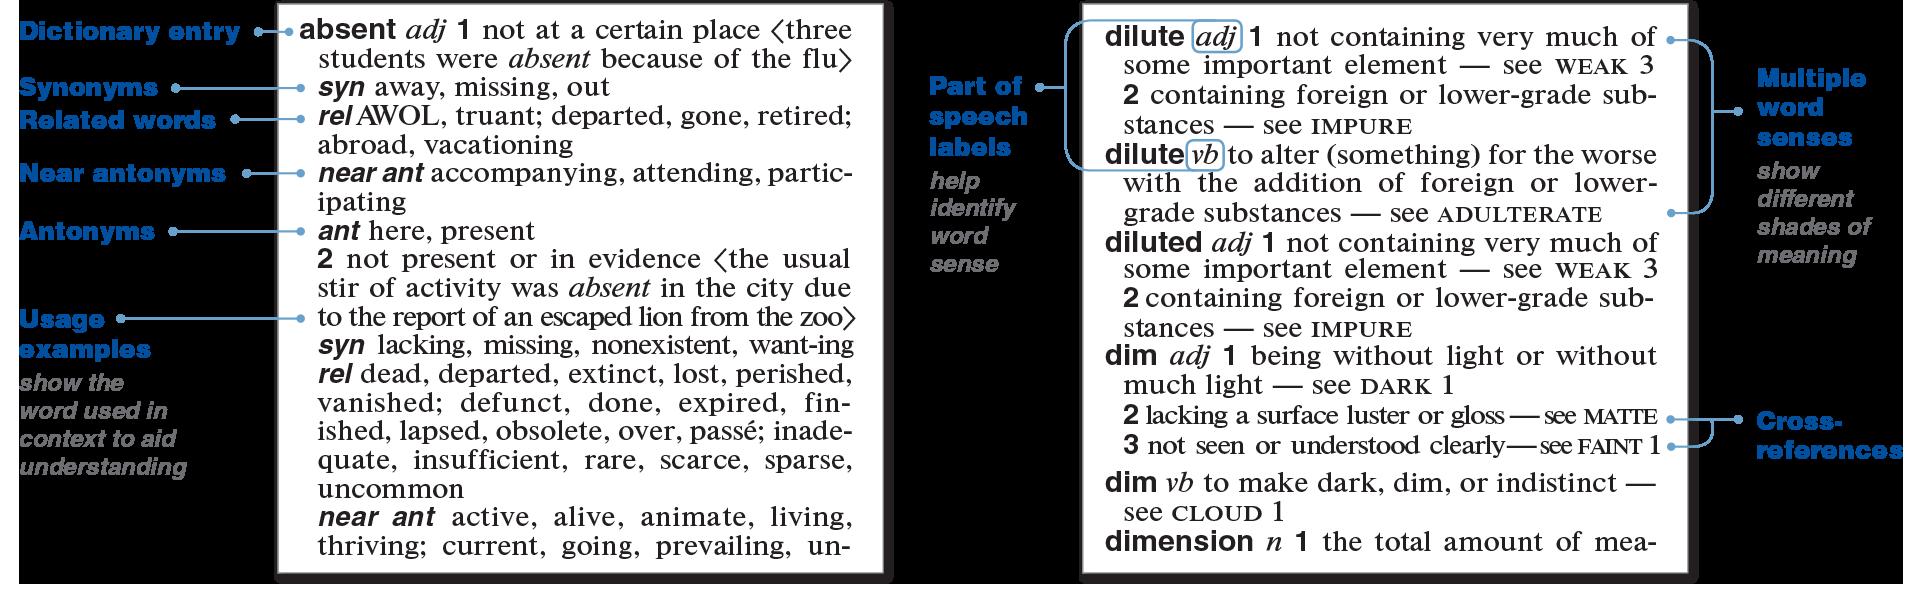 93c39dee1 The Merriam-Webster Thesaurus  Merriam-Webster  9780877798507 ...